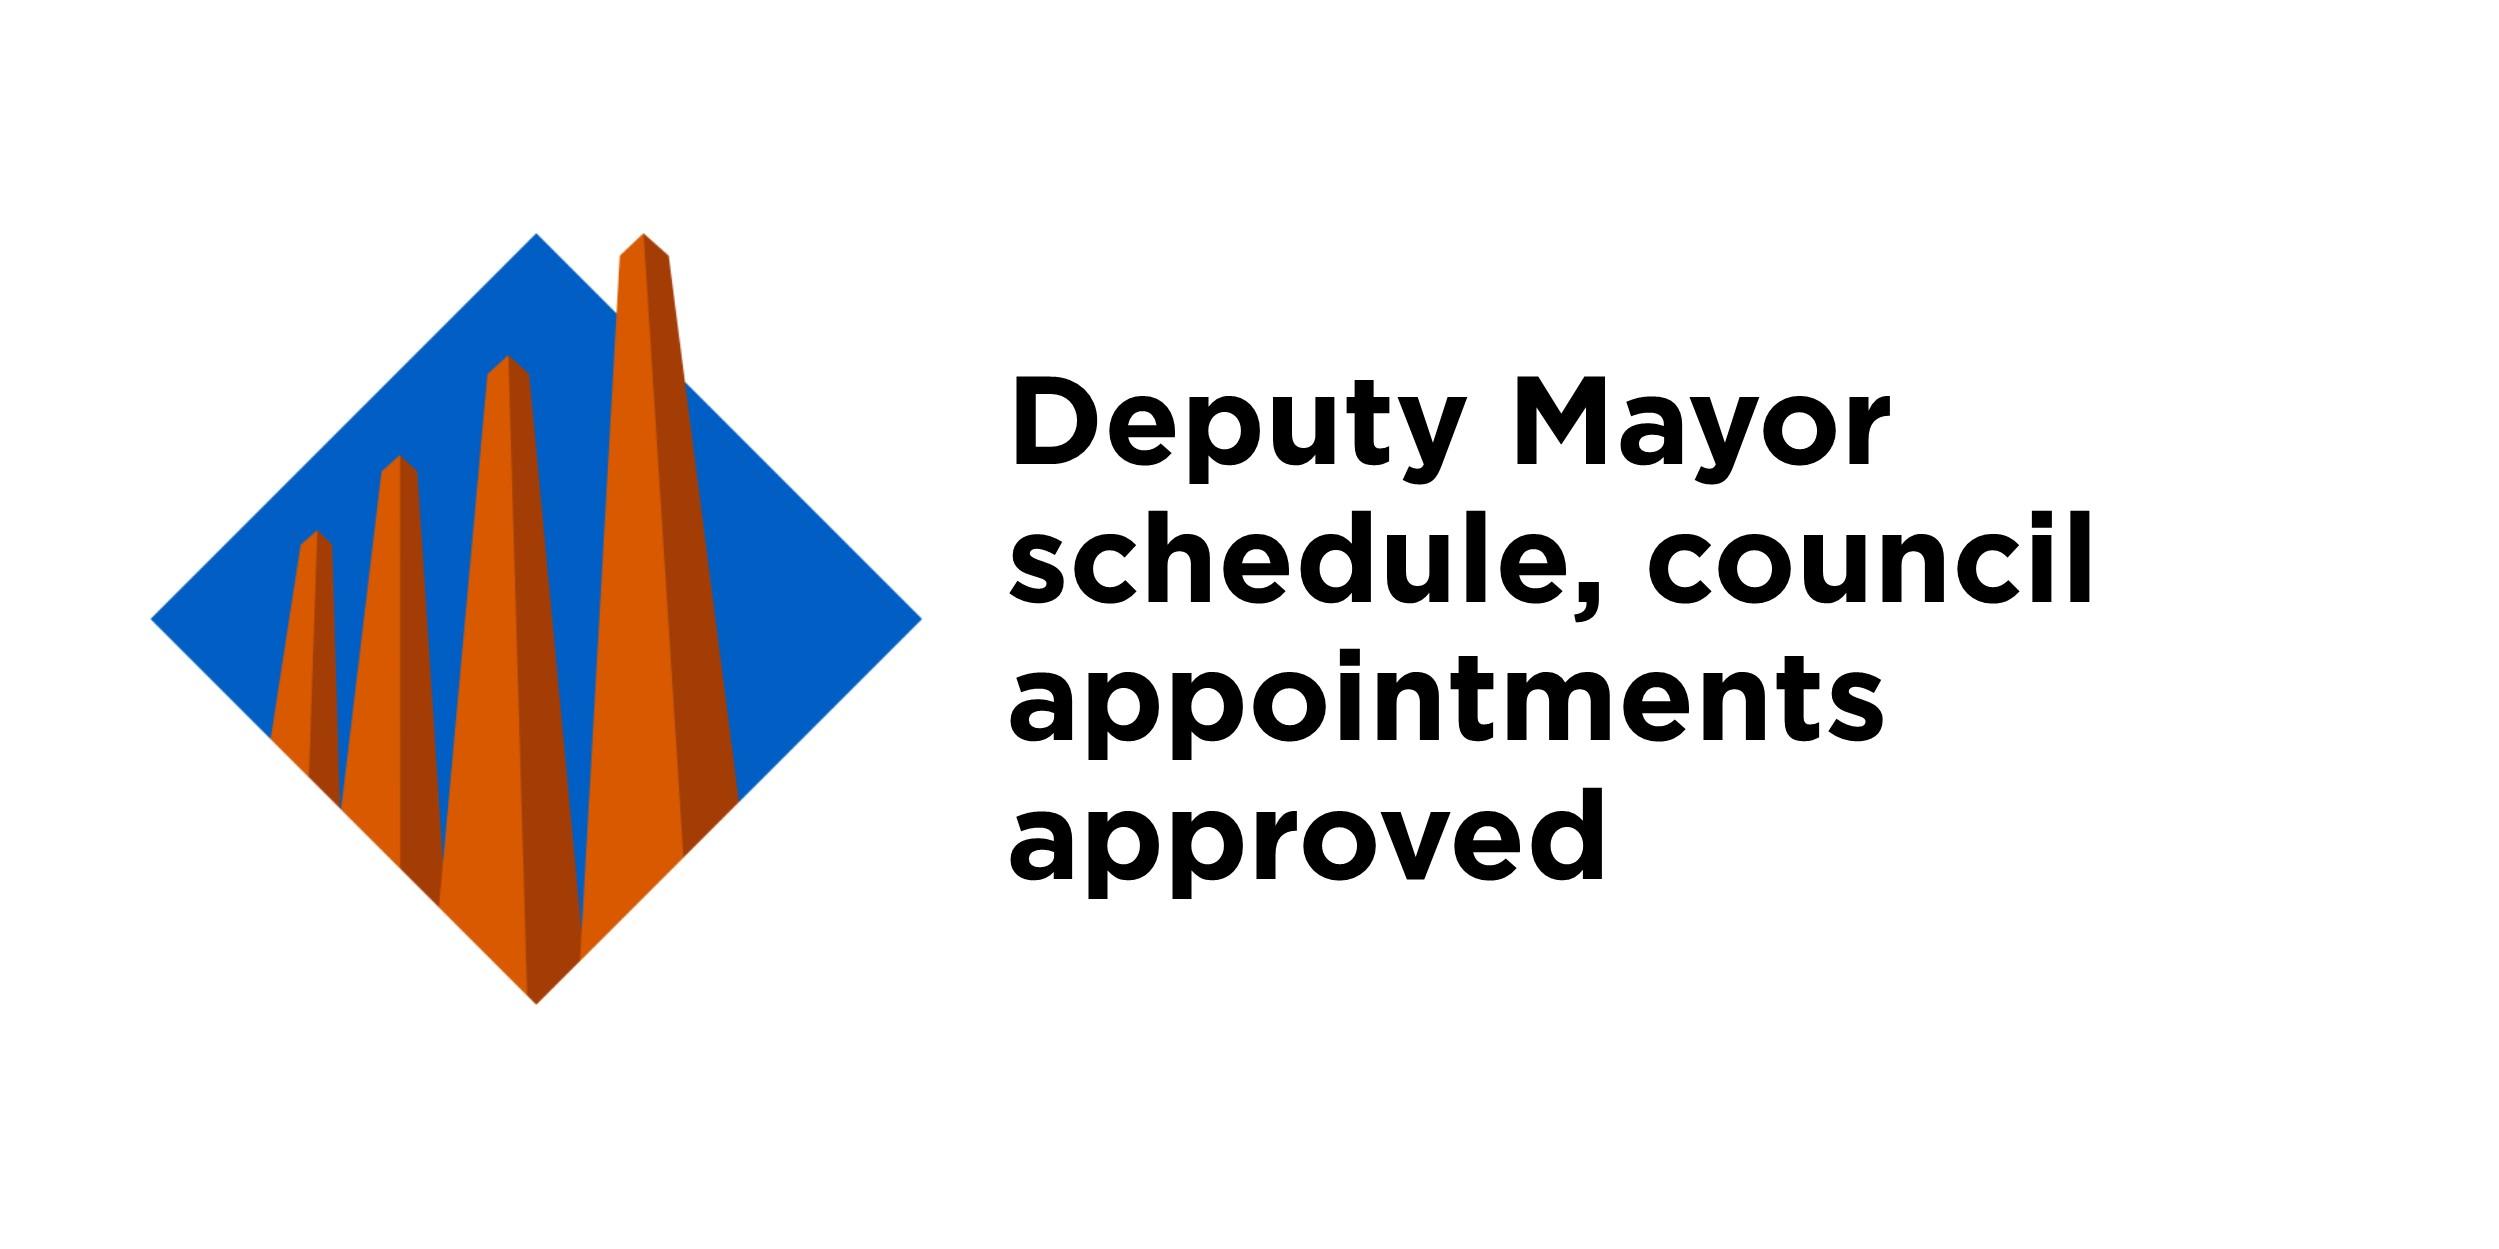 Deputy mayor schedule